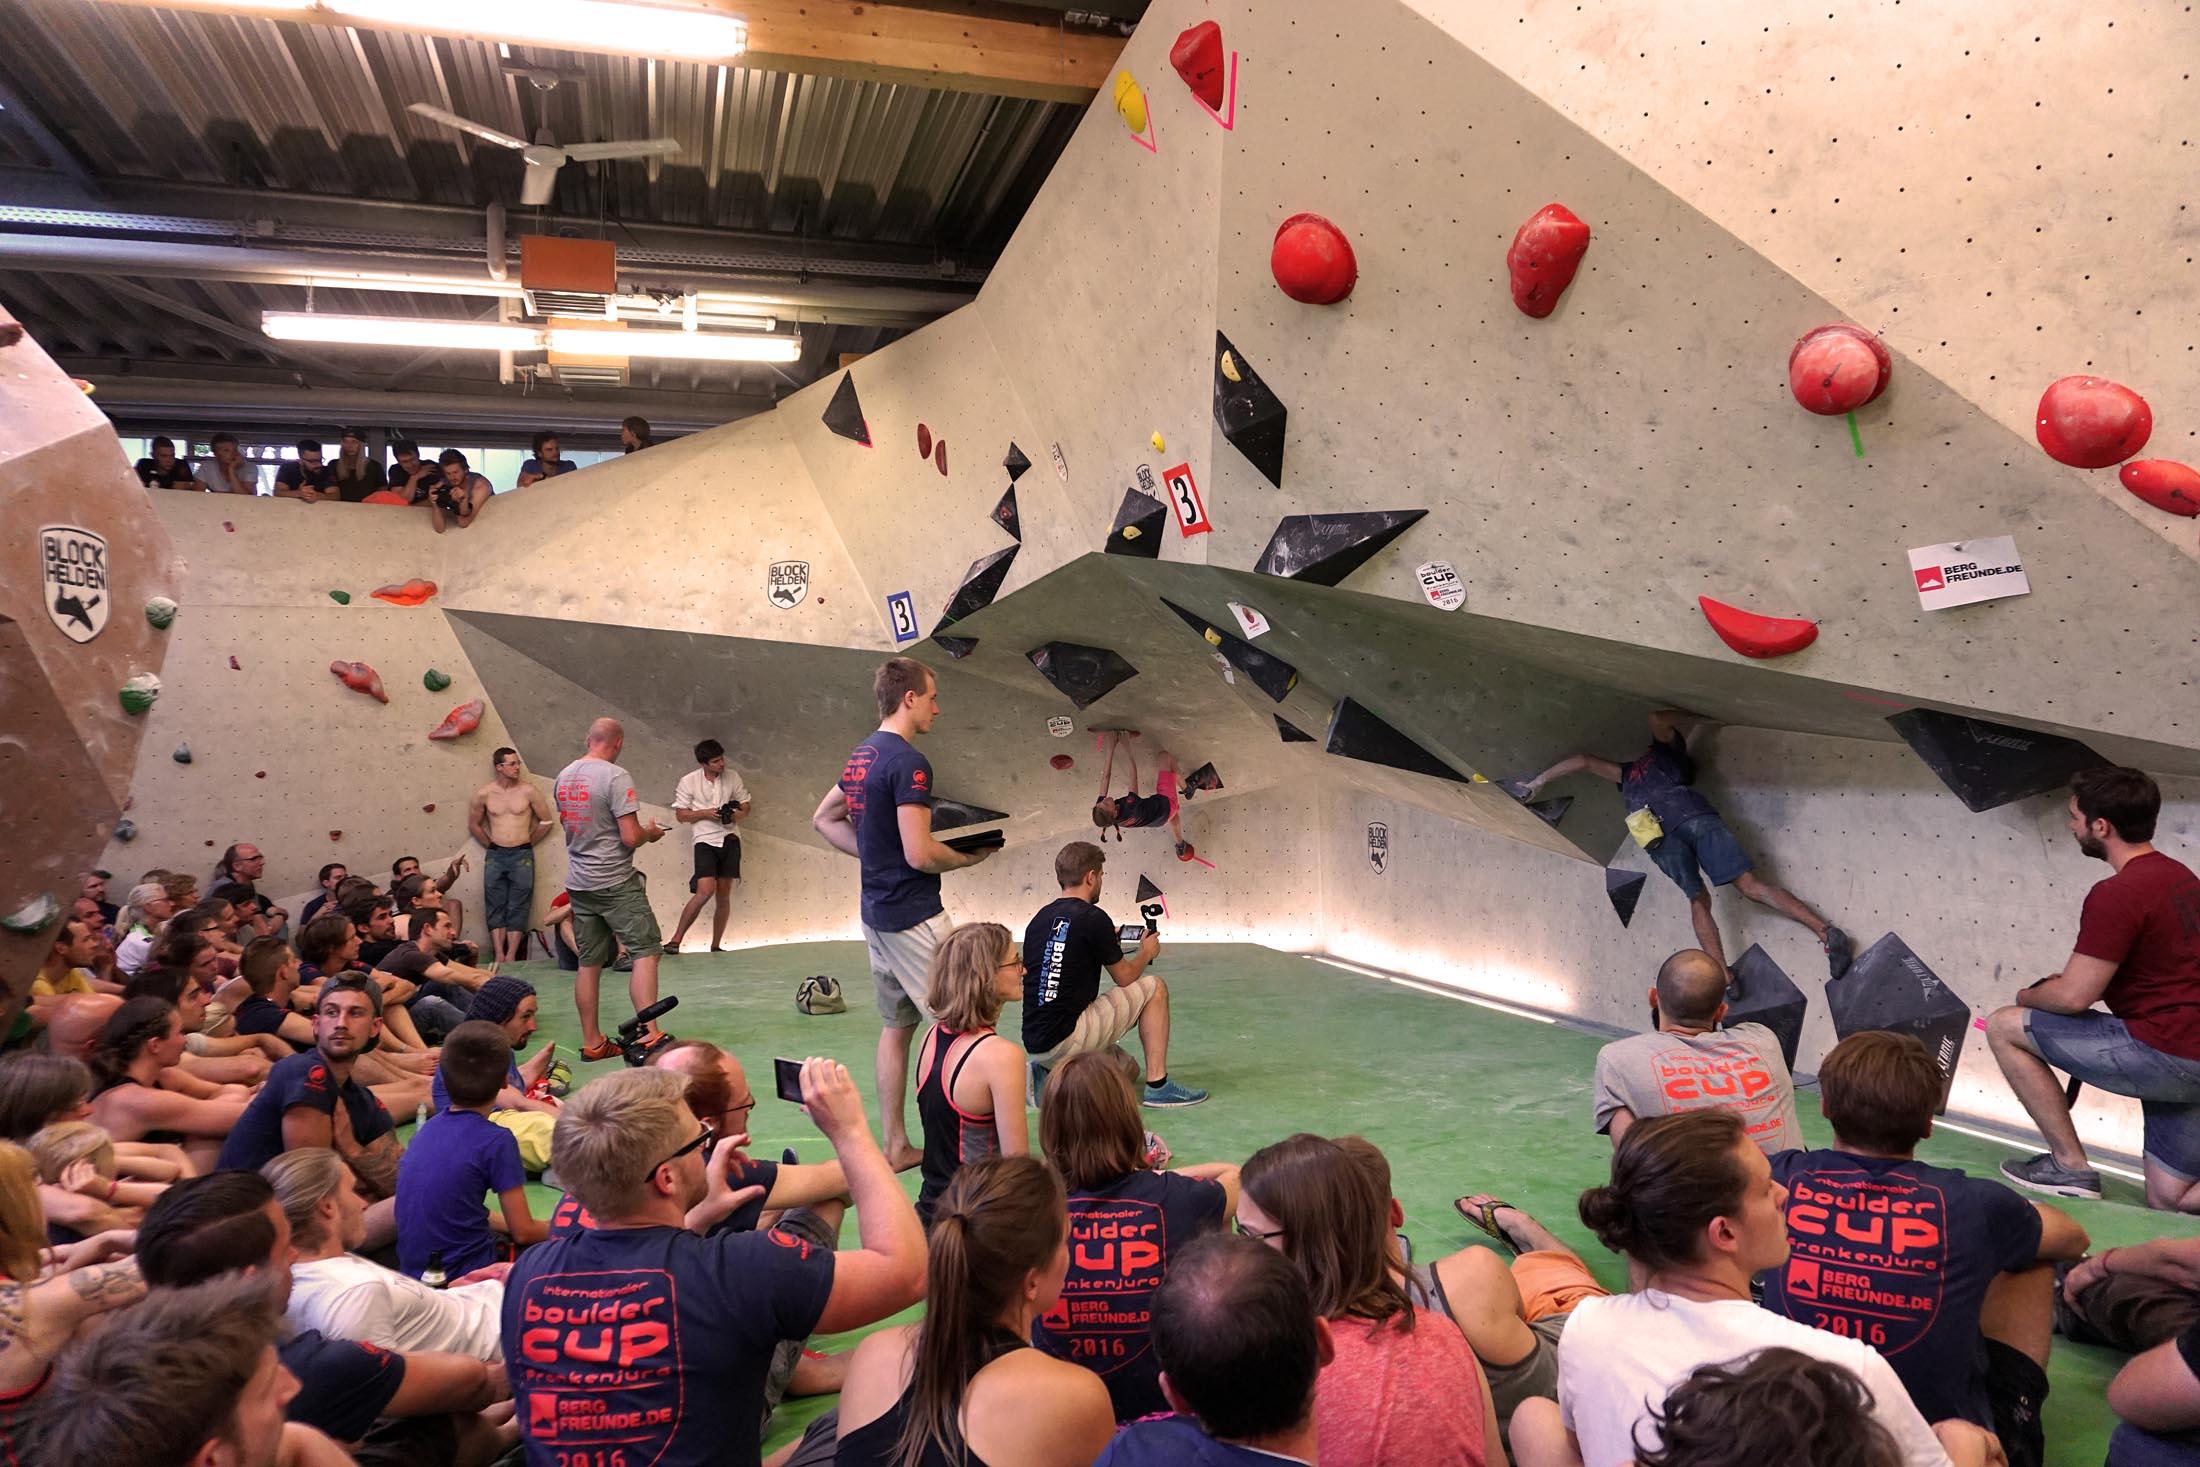 Finale, internationaler bouldercup Frankenjura 2016, BLOCKHELDEN Erlangen, Mammut, Bergfreunde.de, Boulderwettkampf07092016710